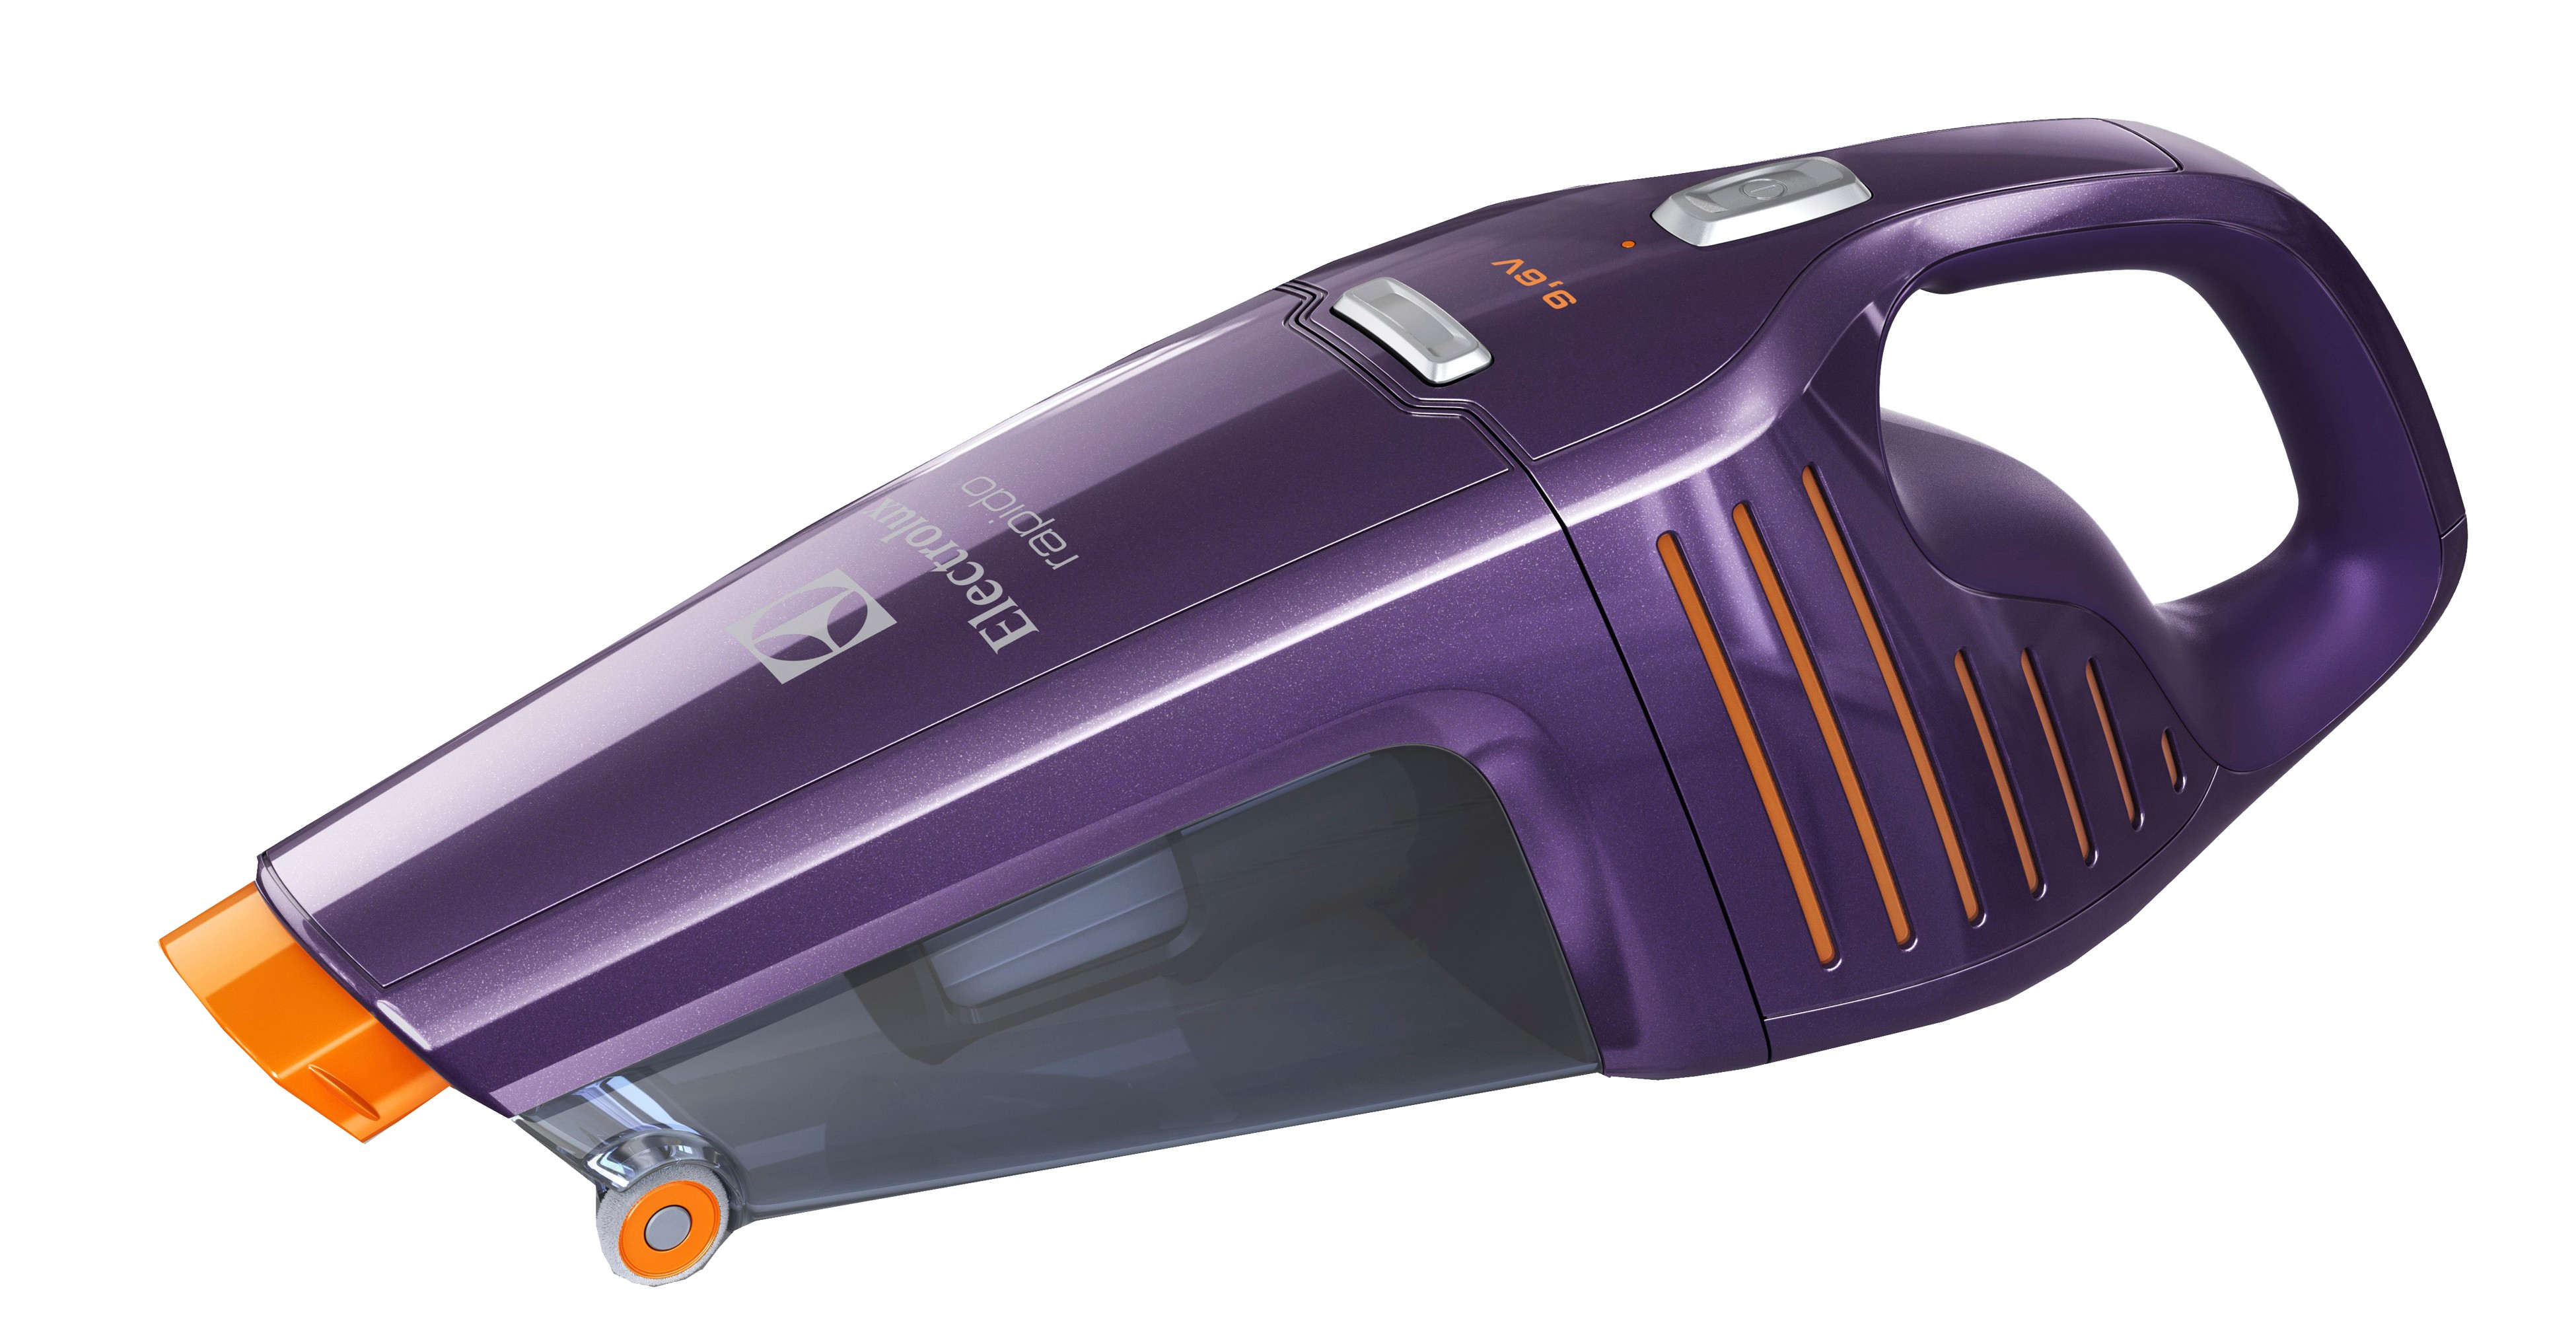 ZB5108 : Electrolux Rapido ZB5108 oppladbar støvsuger